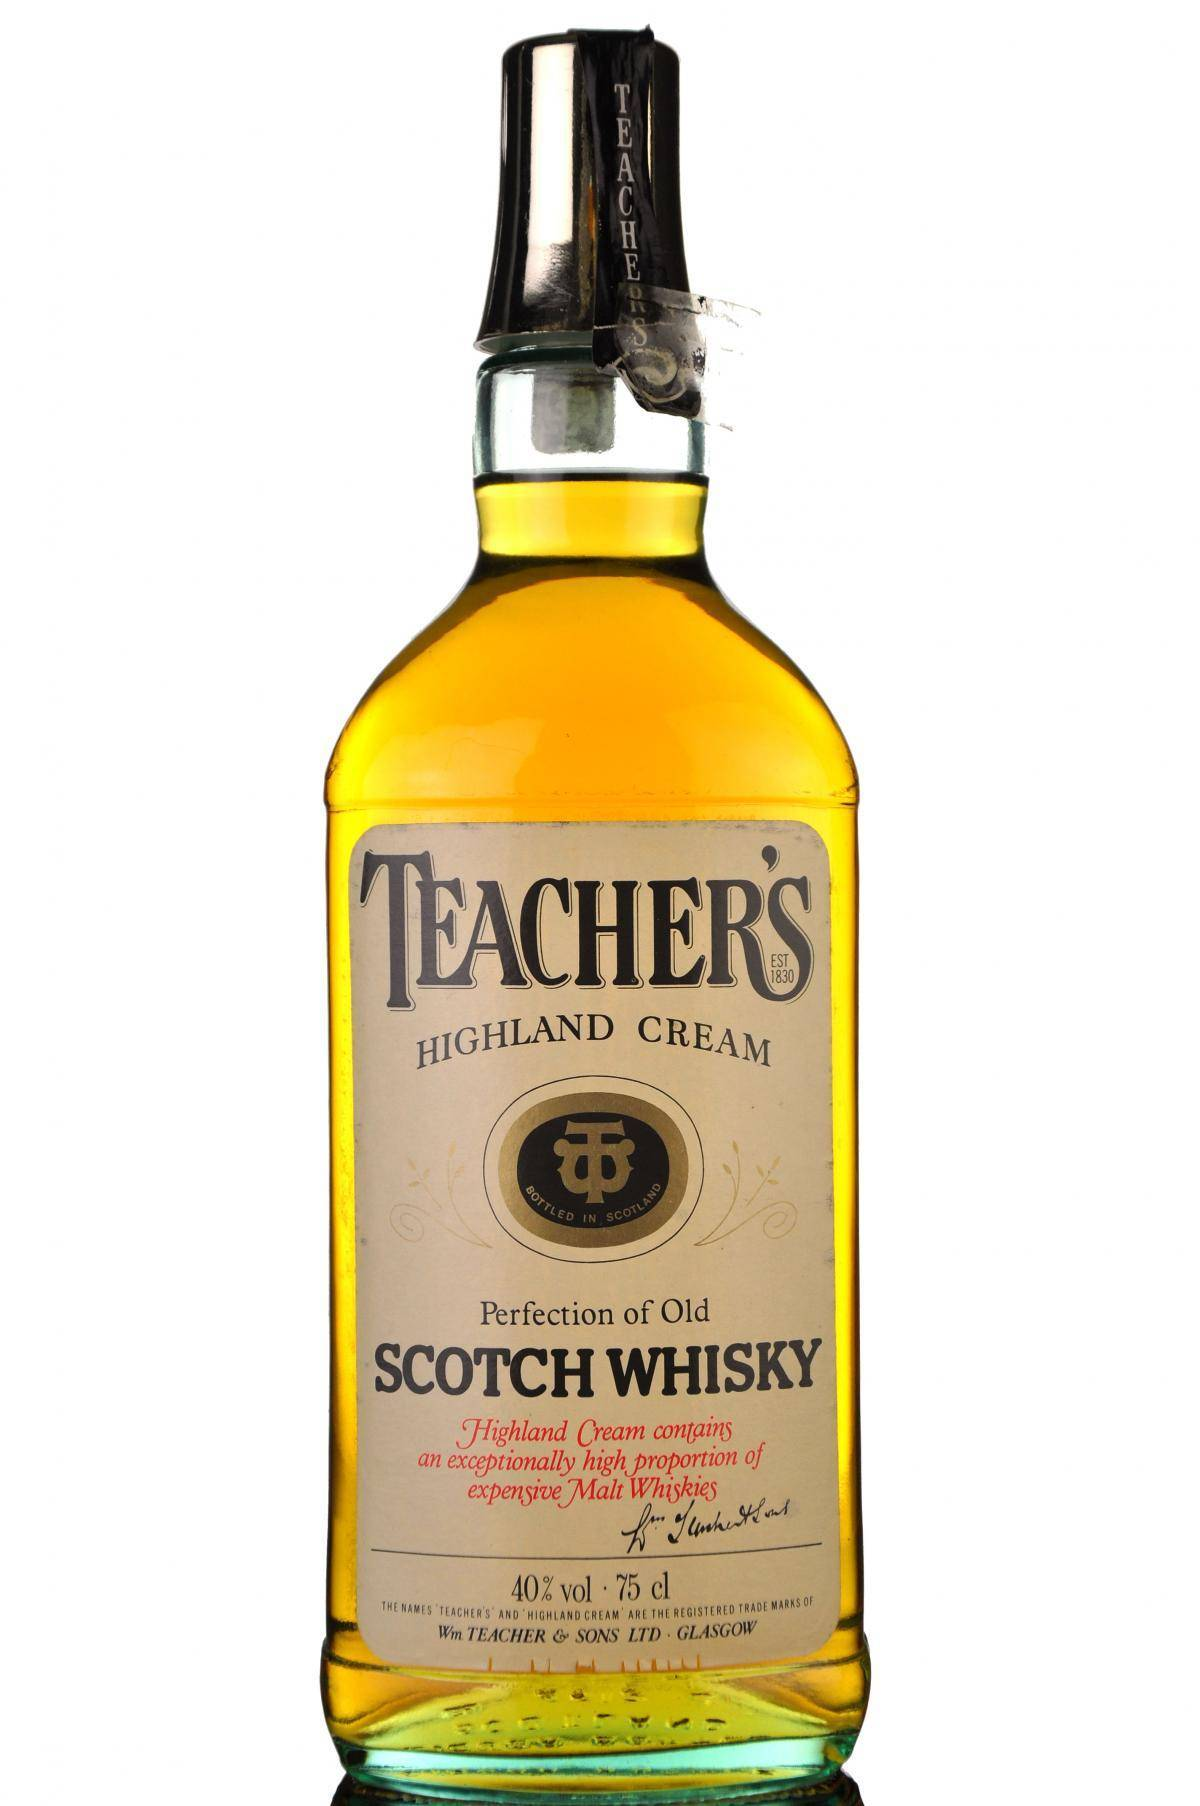 Виски тичерс (teacher's): история бренда и обзор коллекции напитков